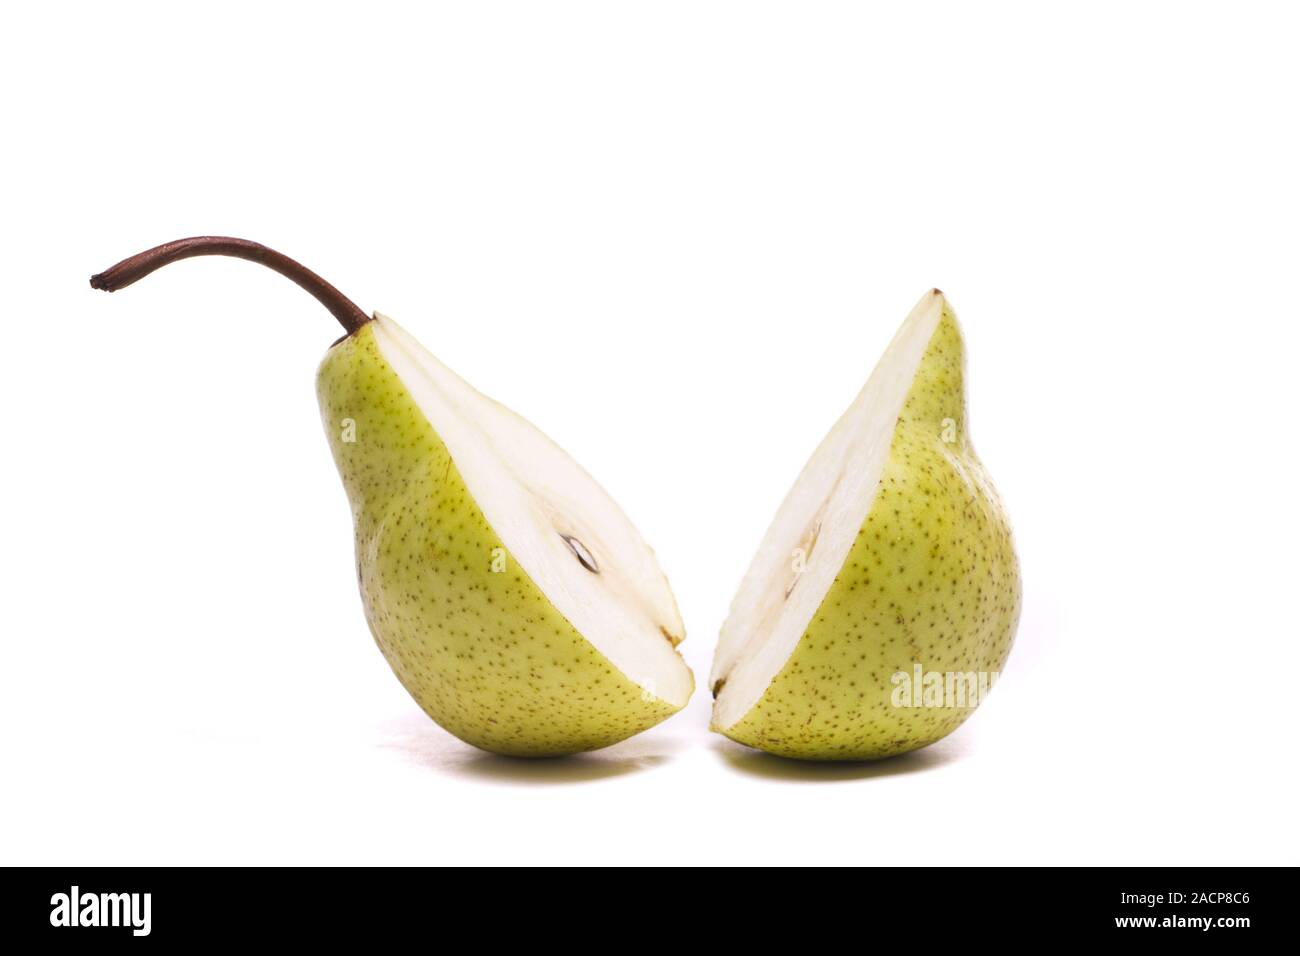 Verde a fette di pere a metà su bianco Foto Stock